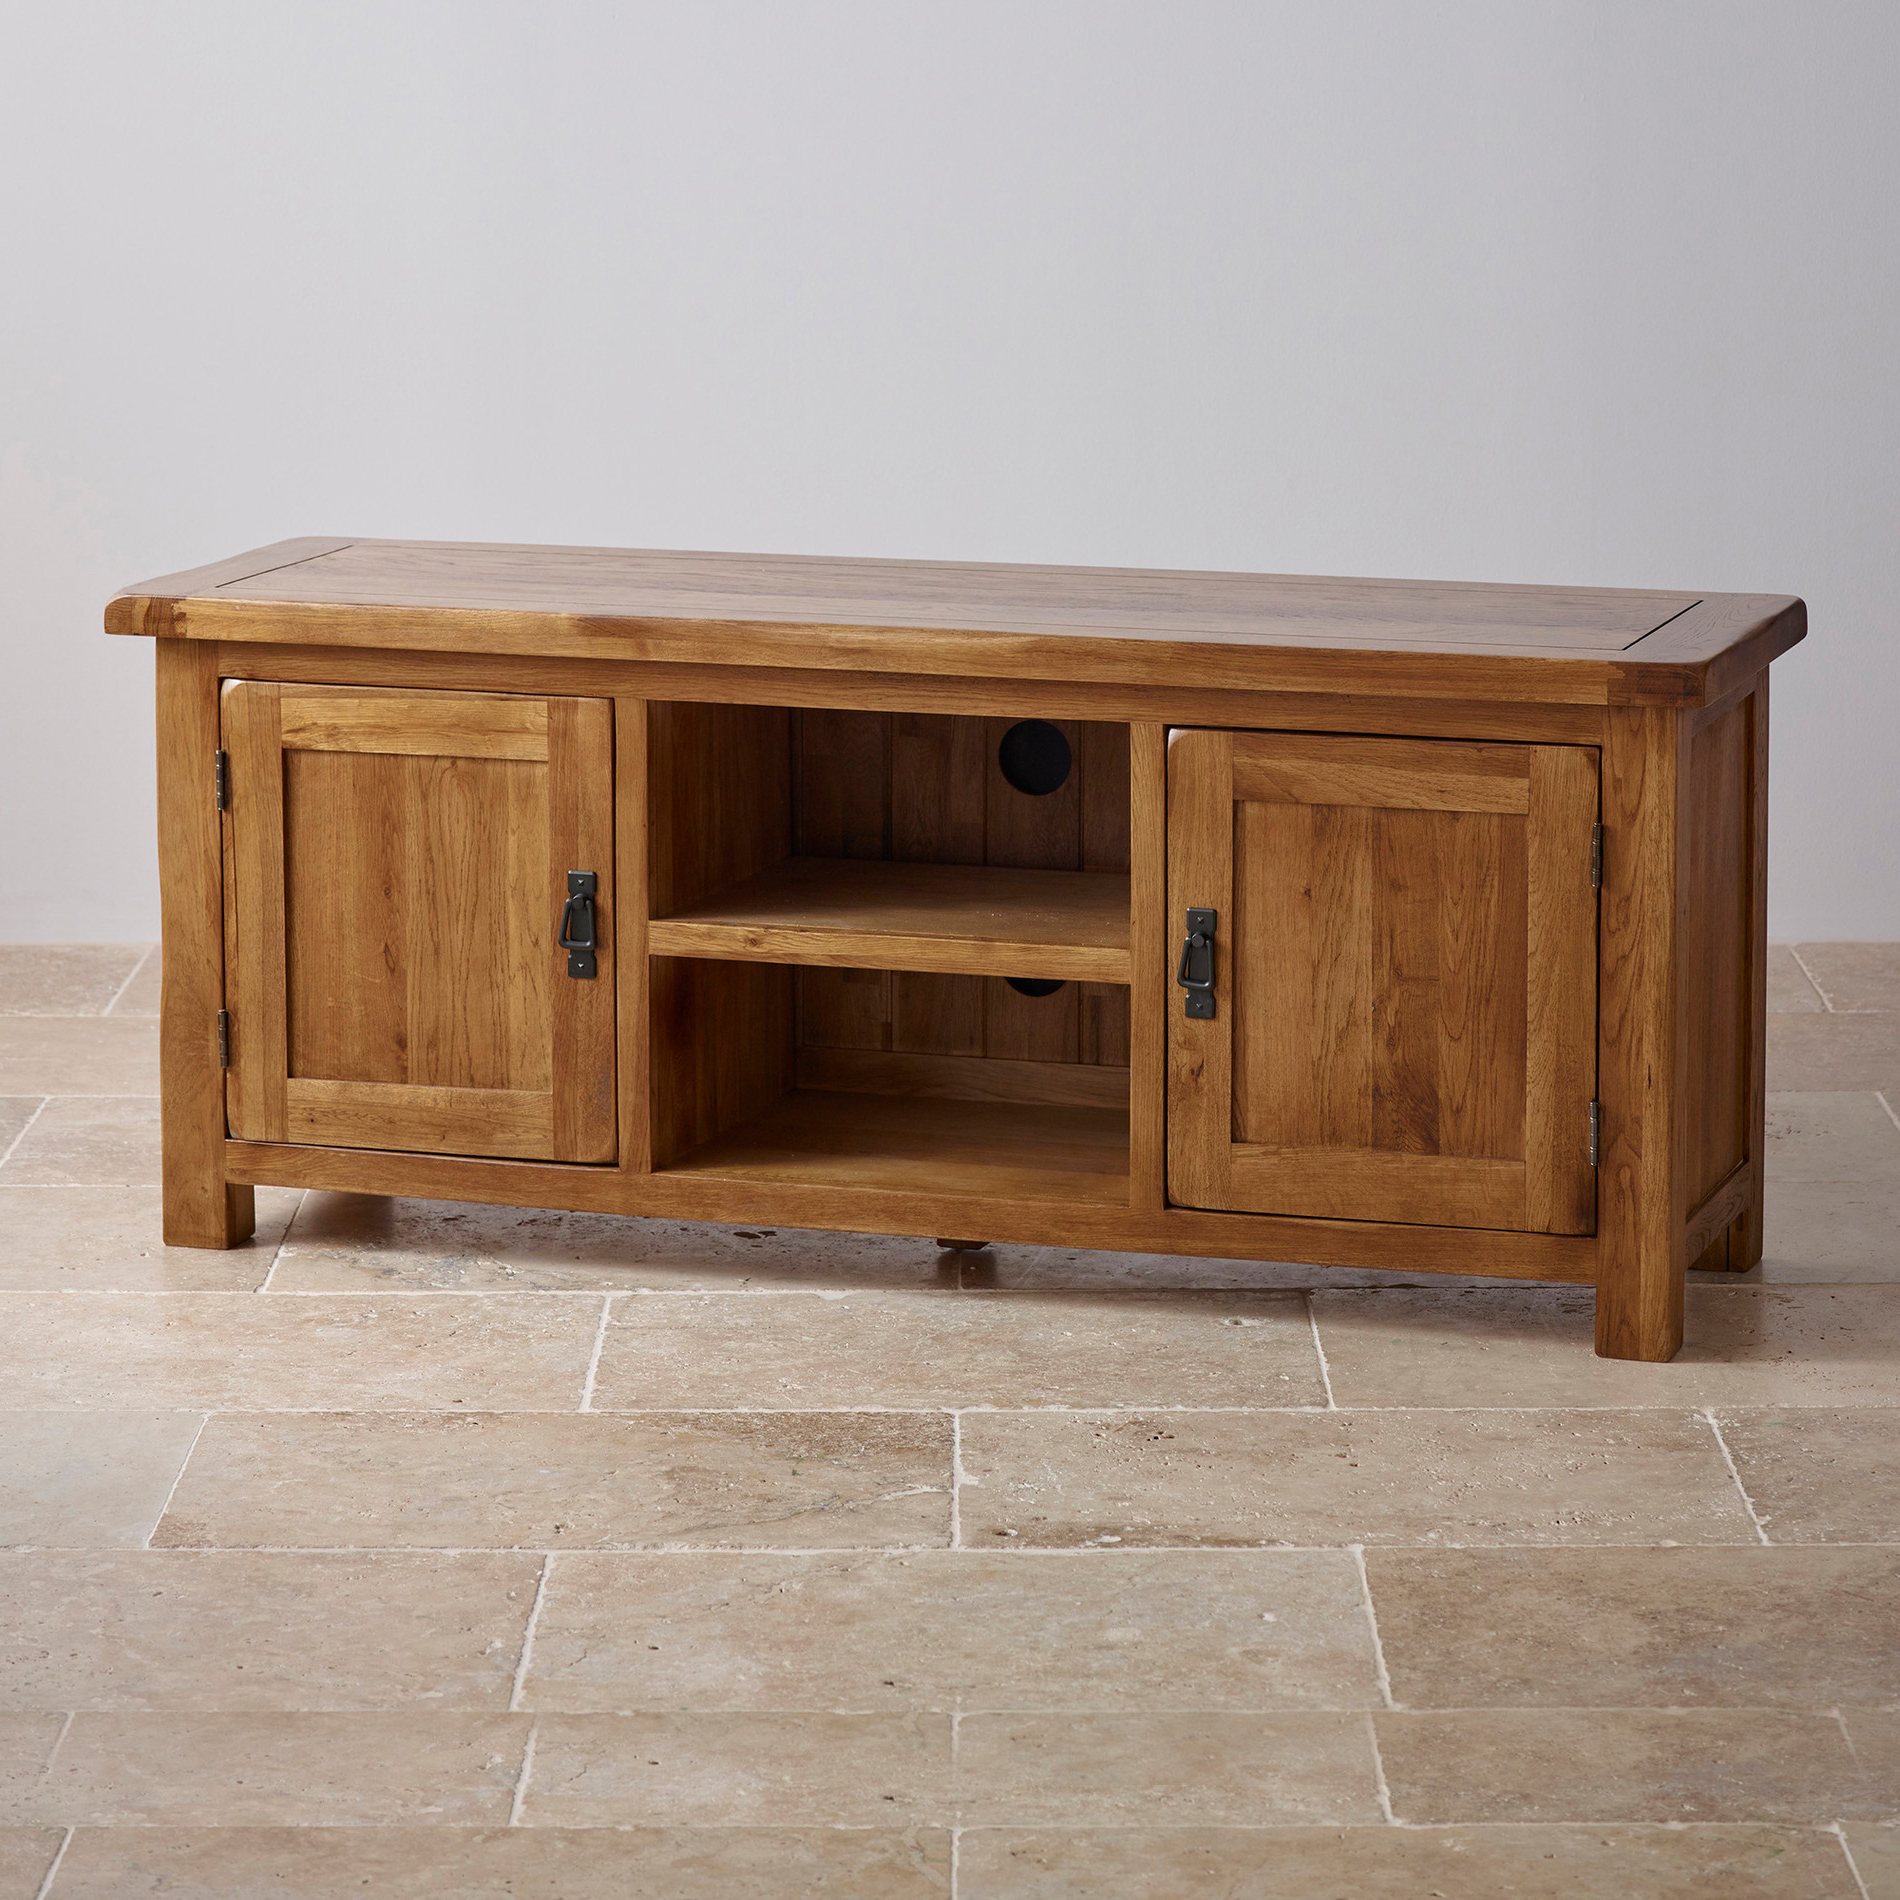 Preferred T V Cabinets Oak Furniture Oak Furniture Land Tv Cabinet Bedside Inside Oak Furniture Tv Stands (Gallery 10 of 20)